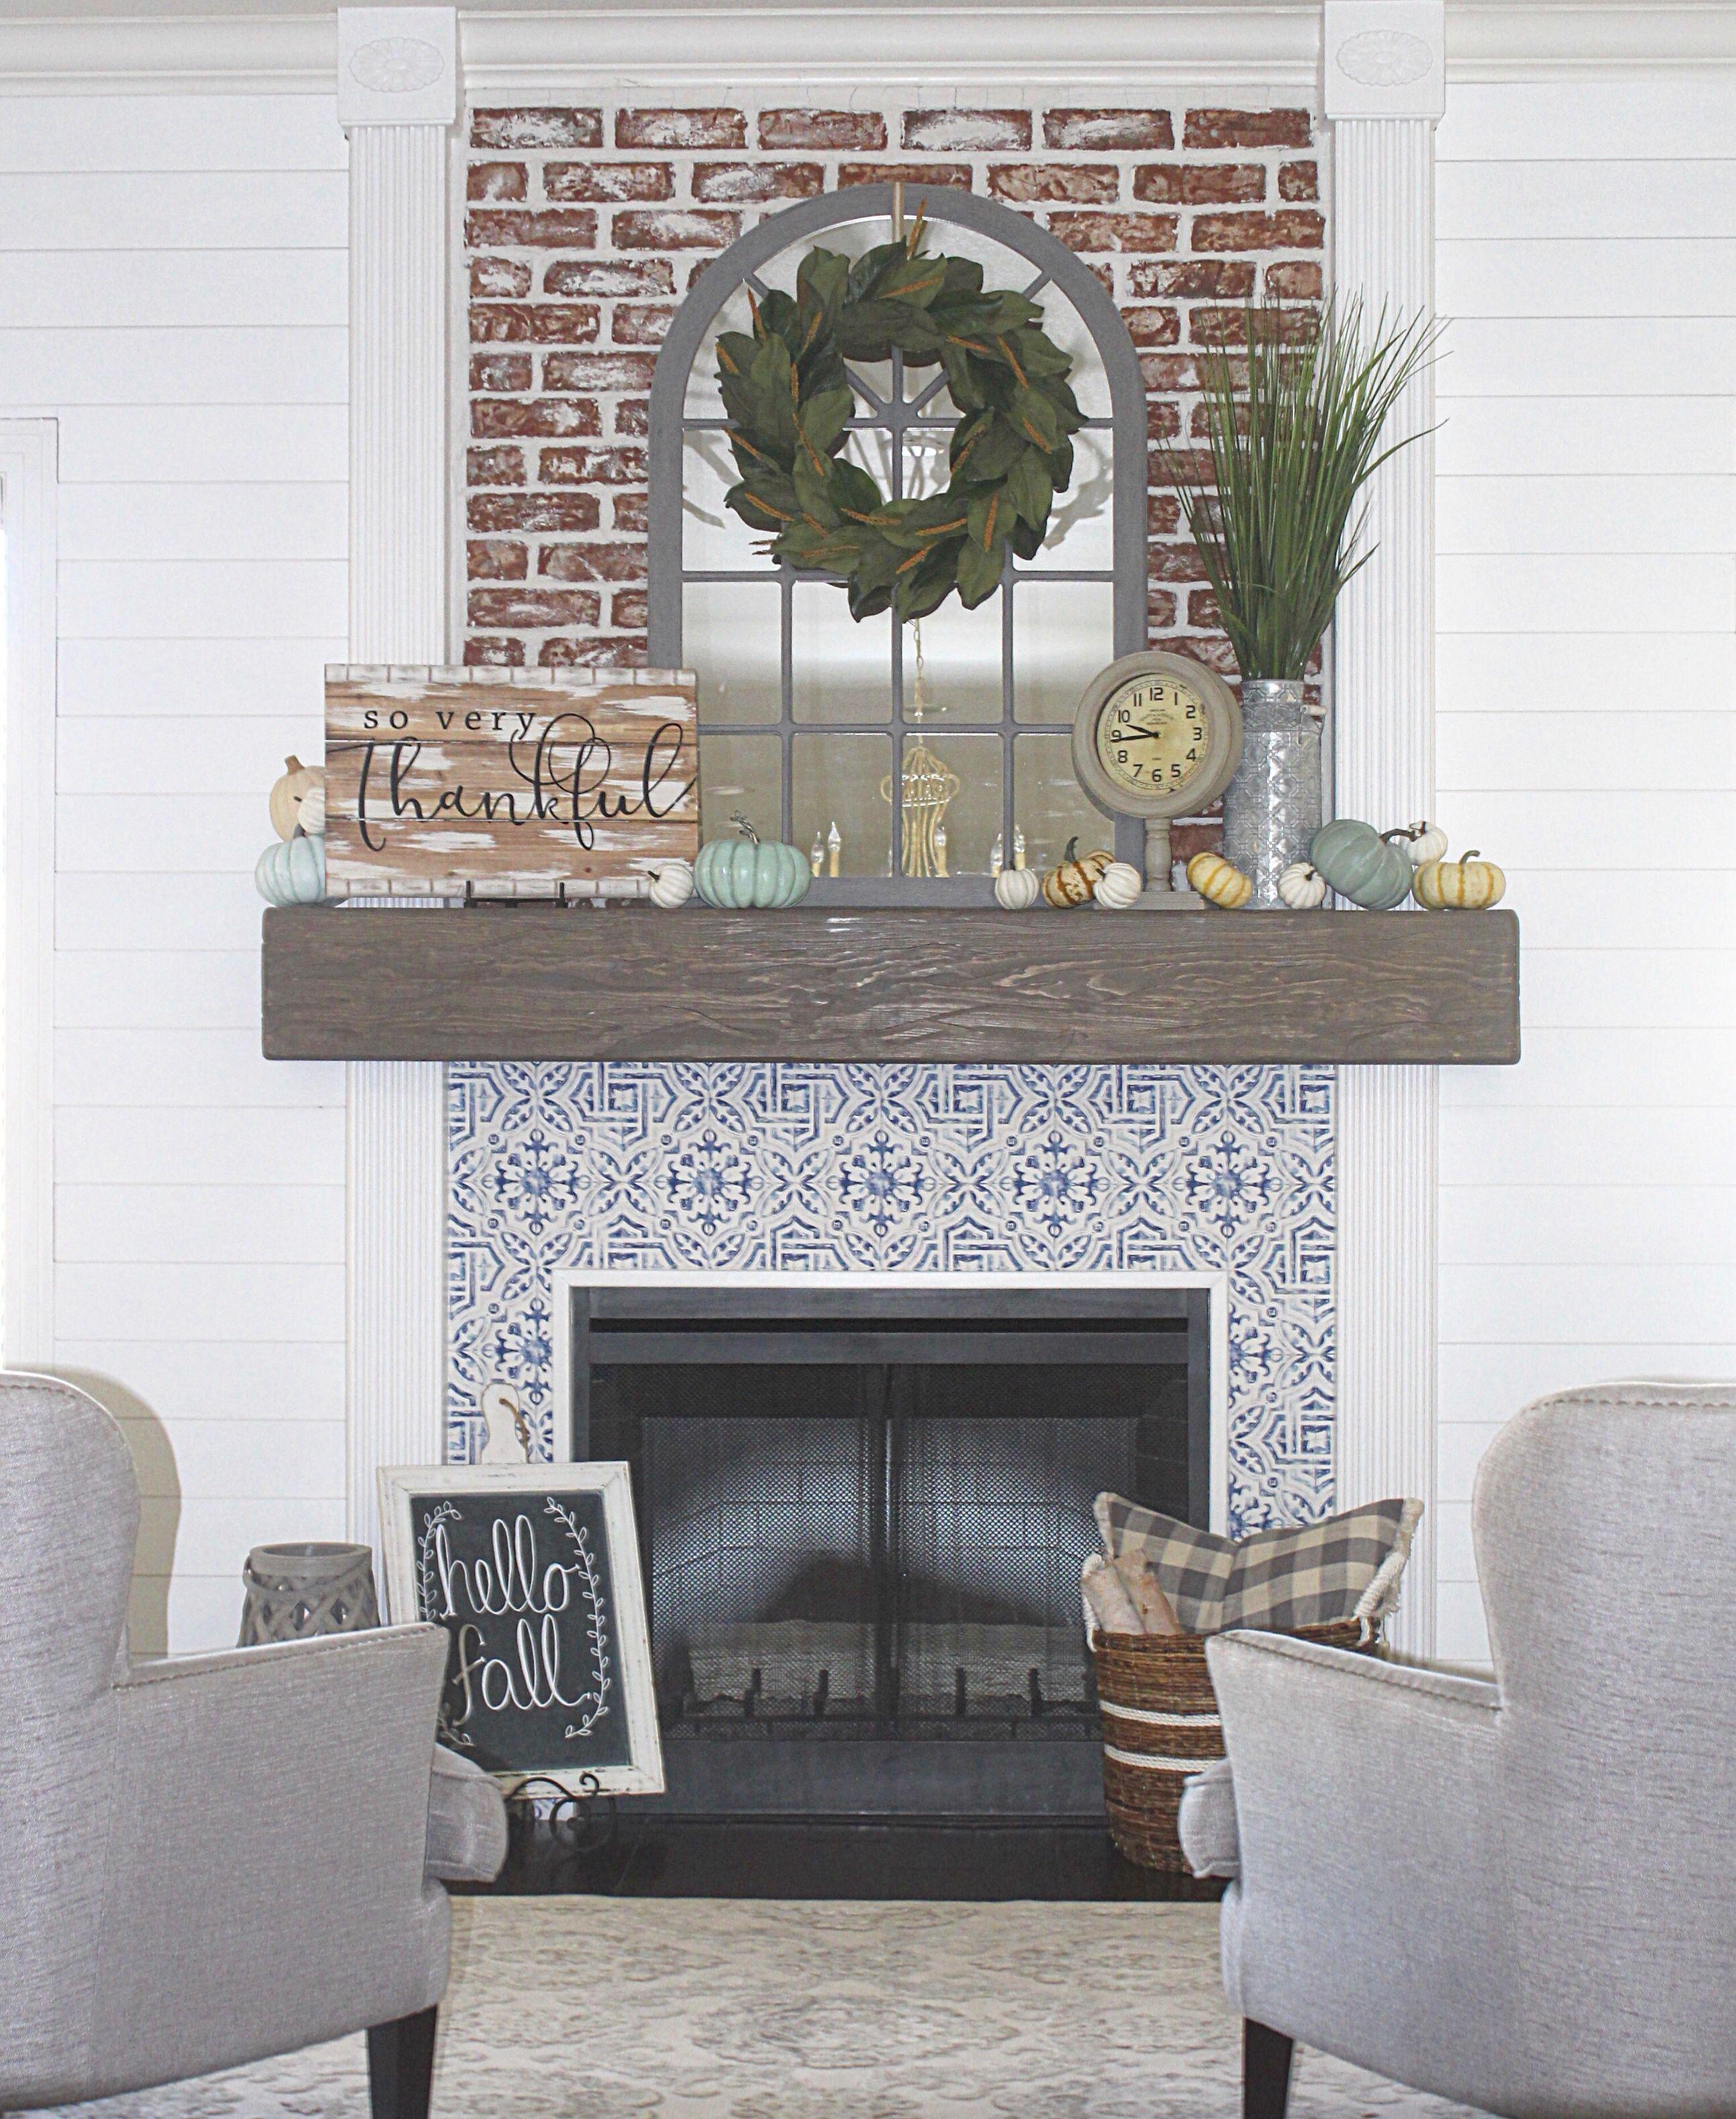 Fireplace illustration book stone fireplace with shiplapdark